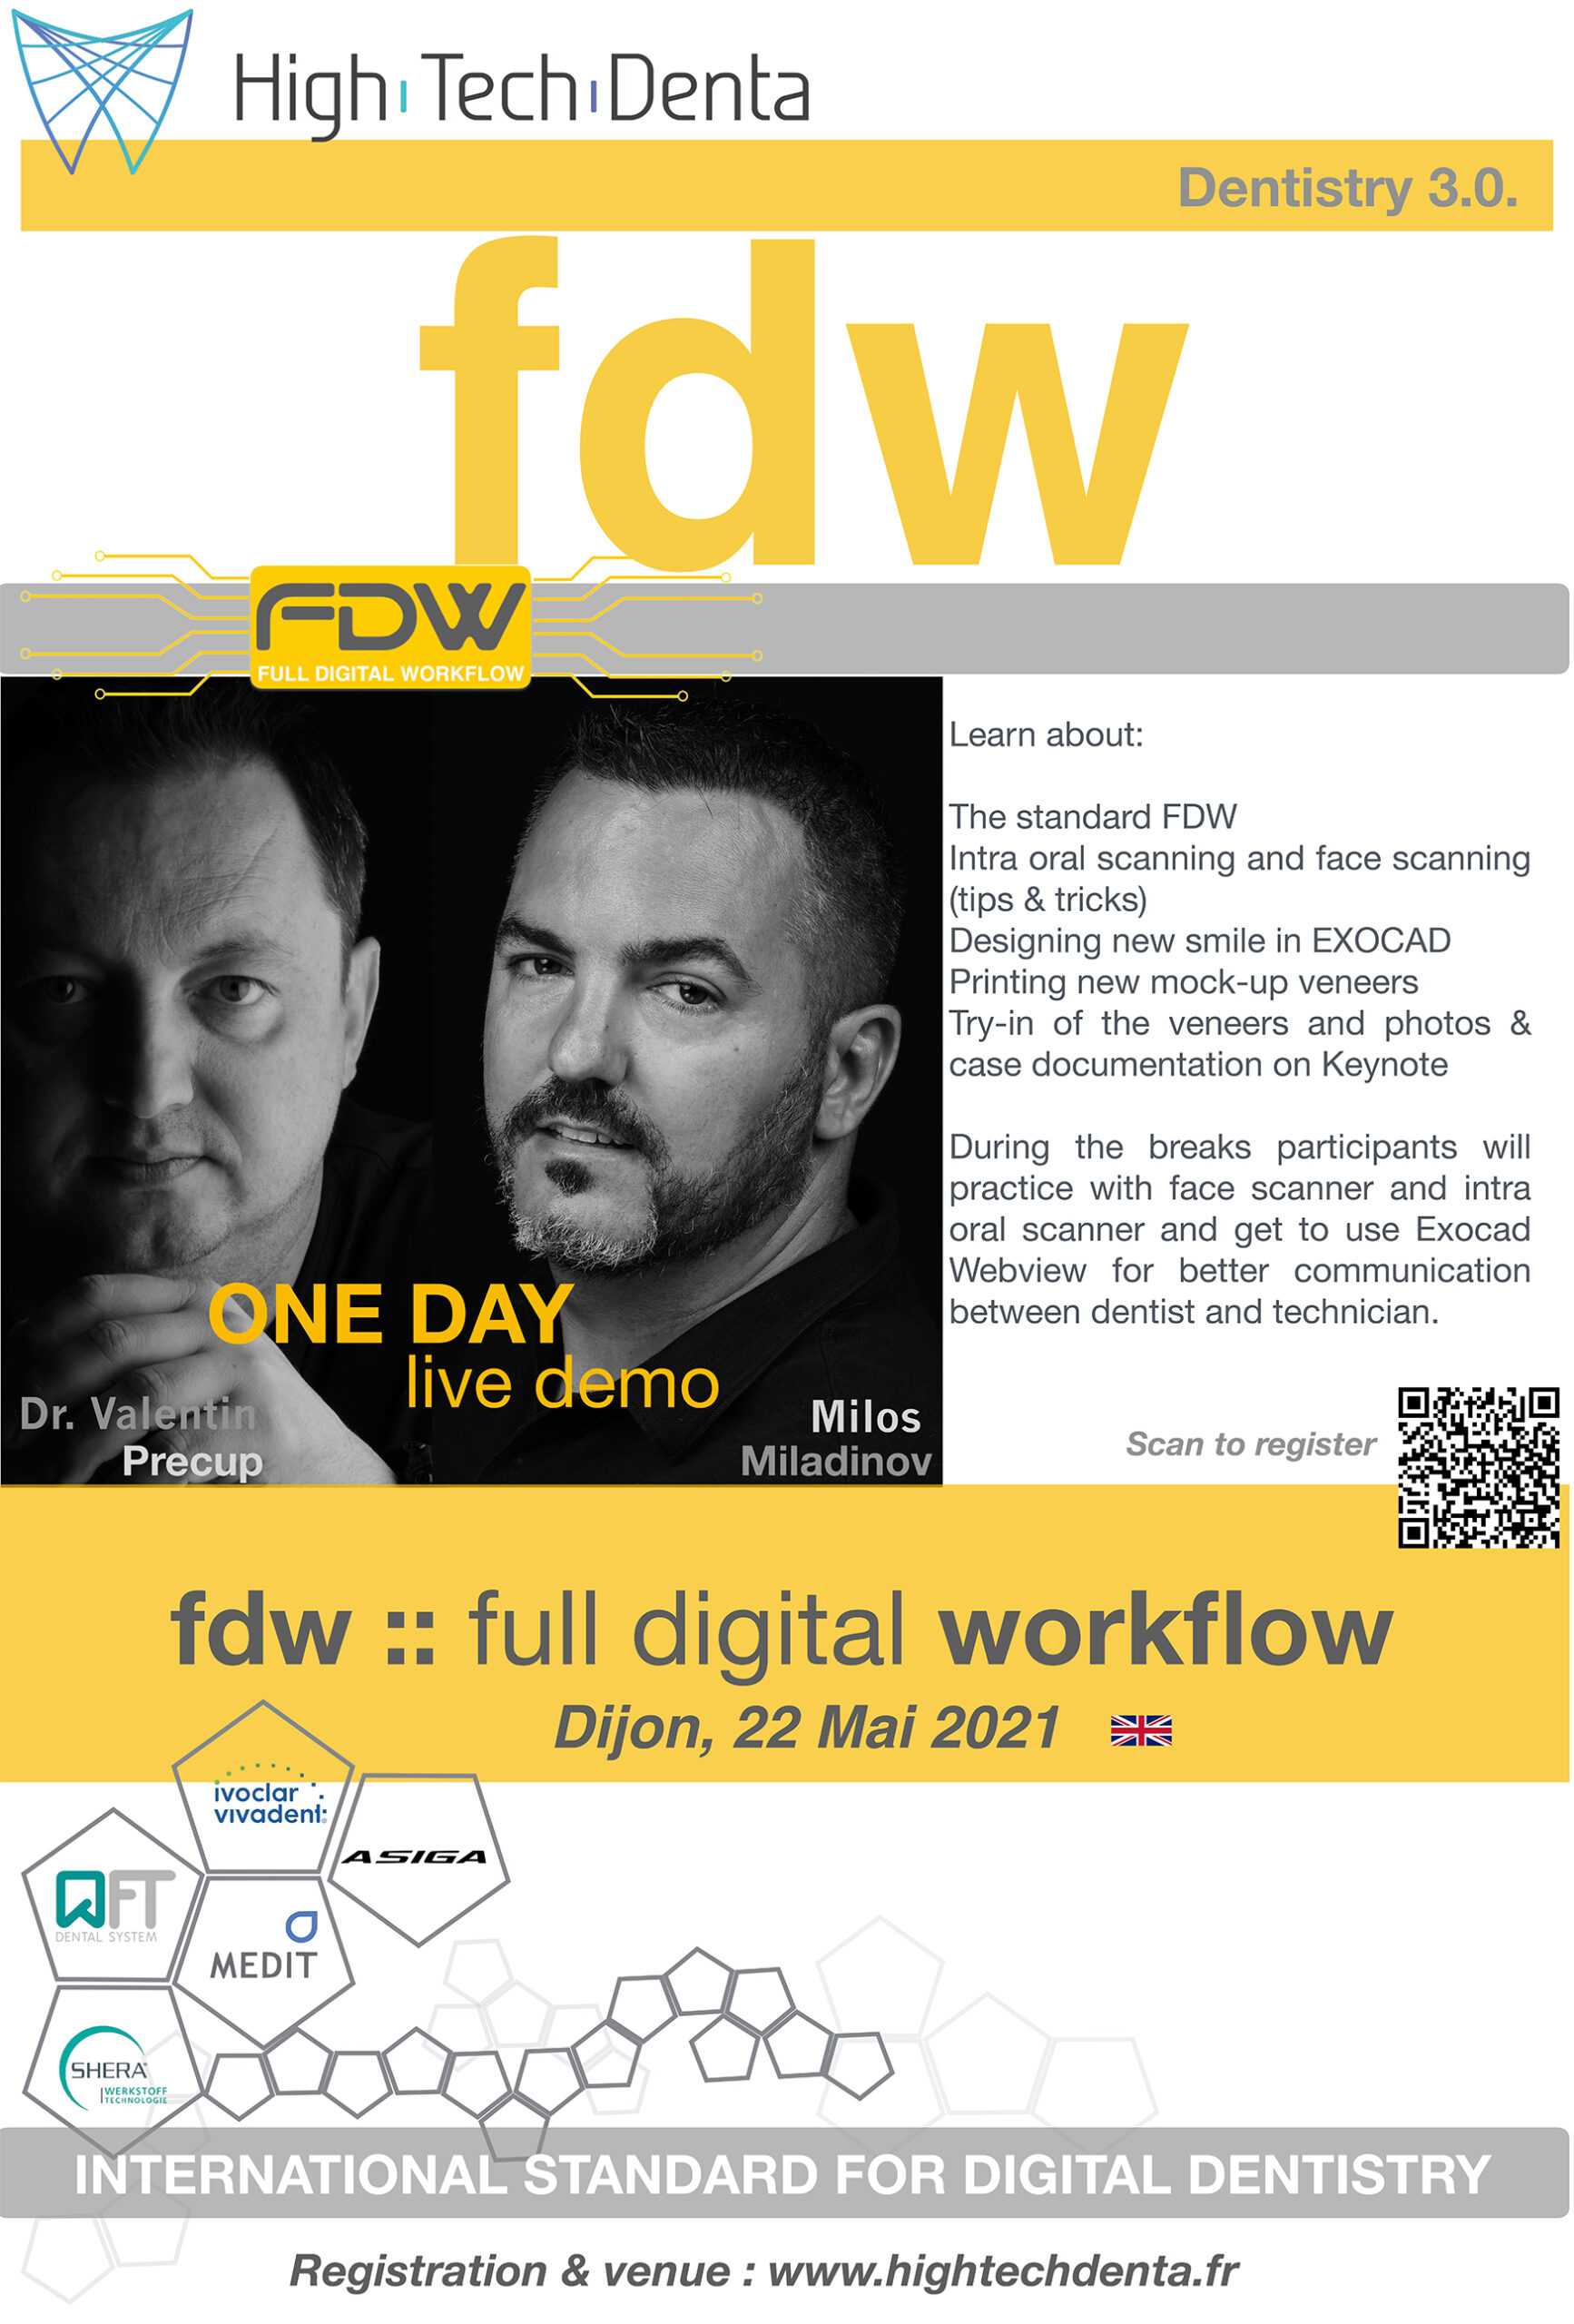 FDW - Full Digital Workflow - Functional design, mockup, printing